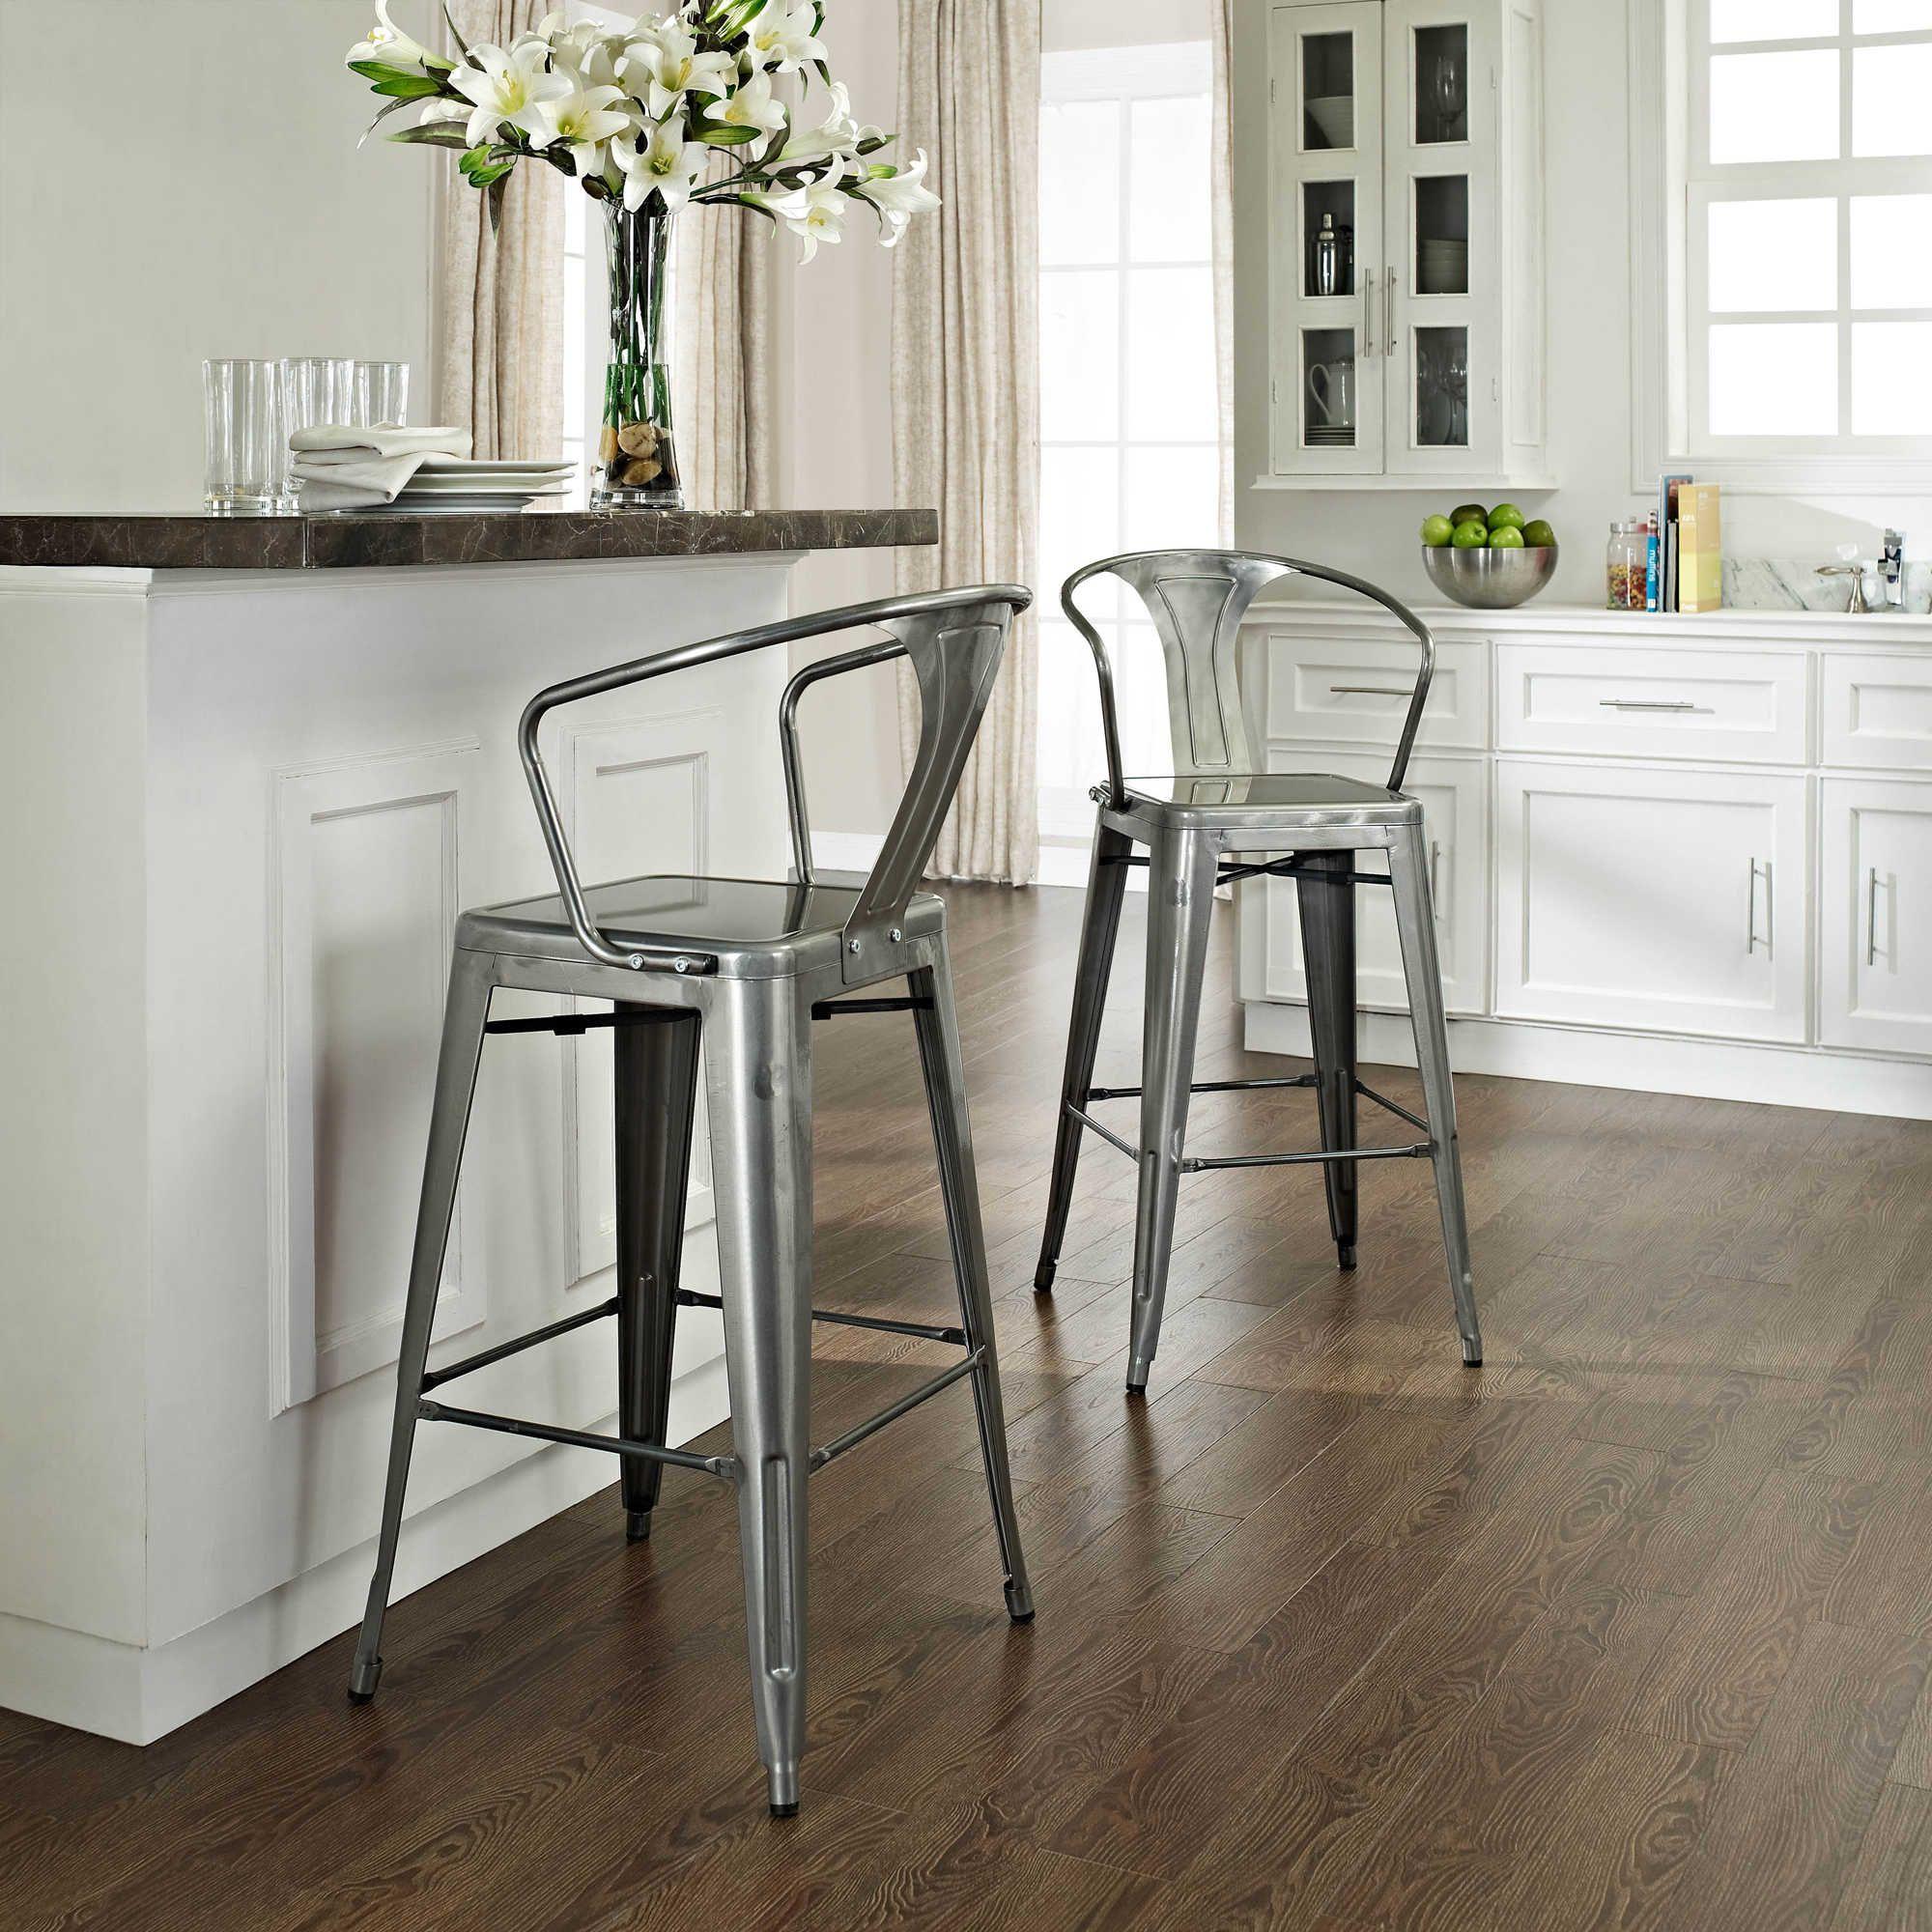 Sensational Crosley Amelia Cafe Barstools Set Of 2 Metal Bar Stools Creativecarmelina Interior Chair Design Creativecarmelinacom